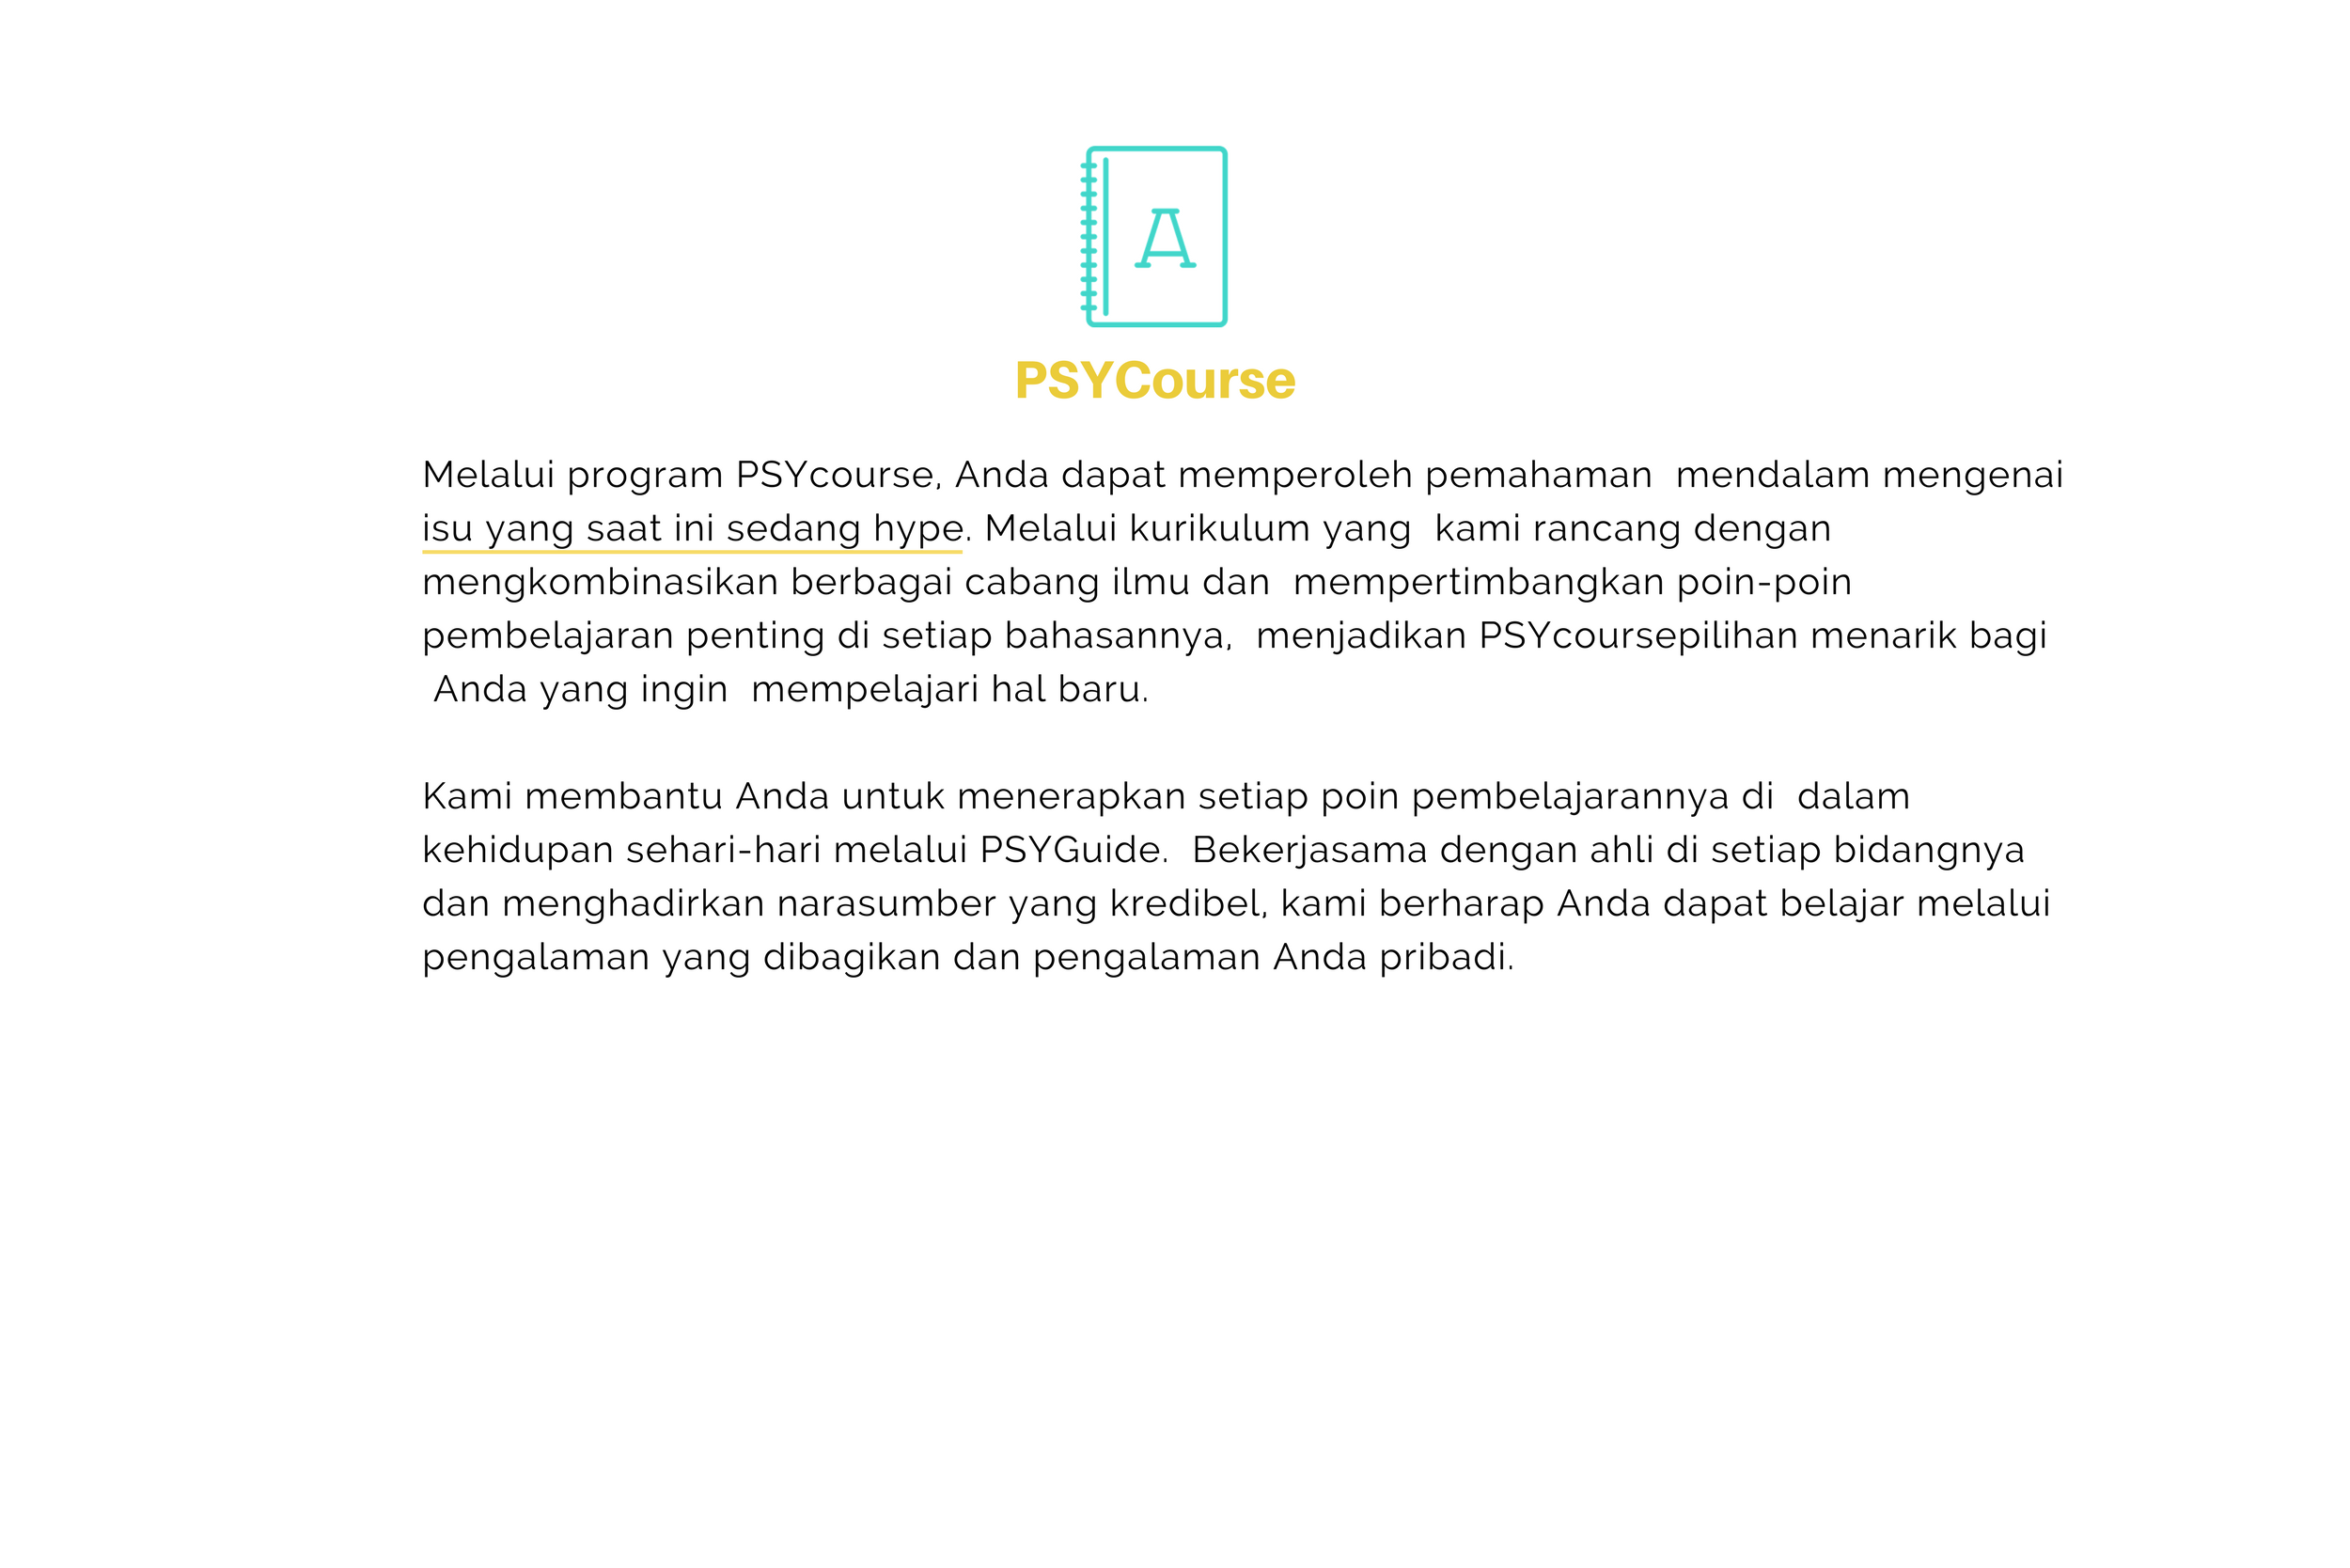 mengapa konseling_ (46).png